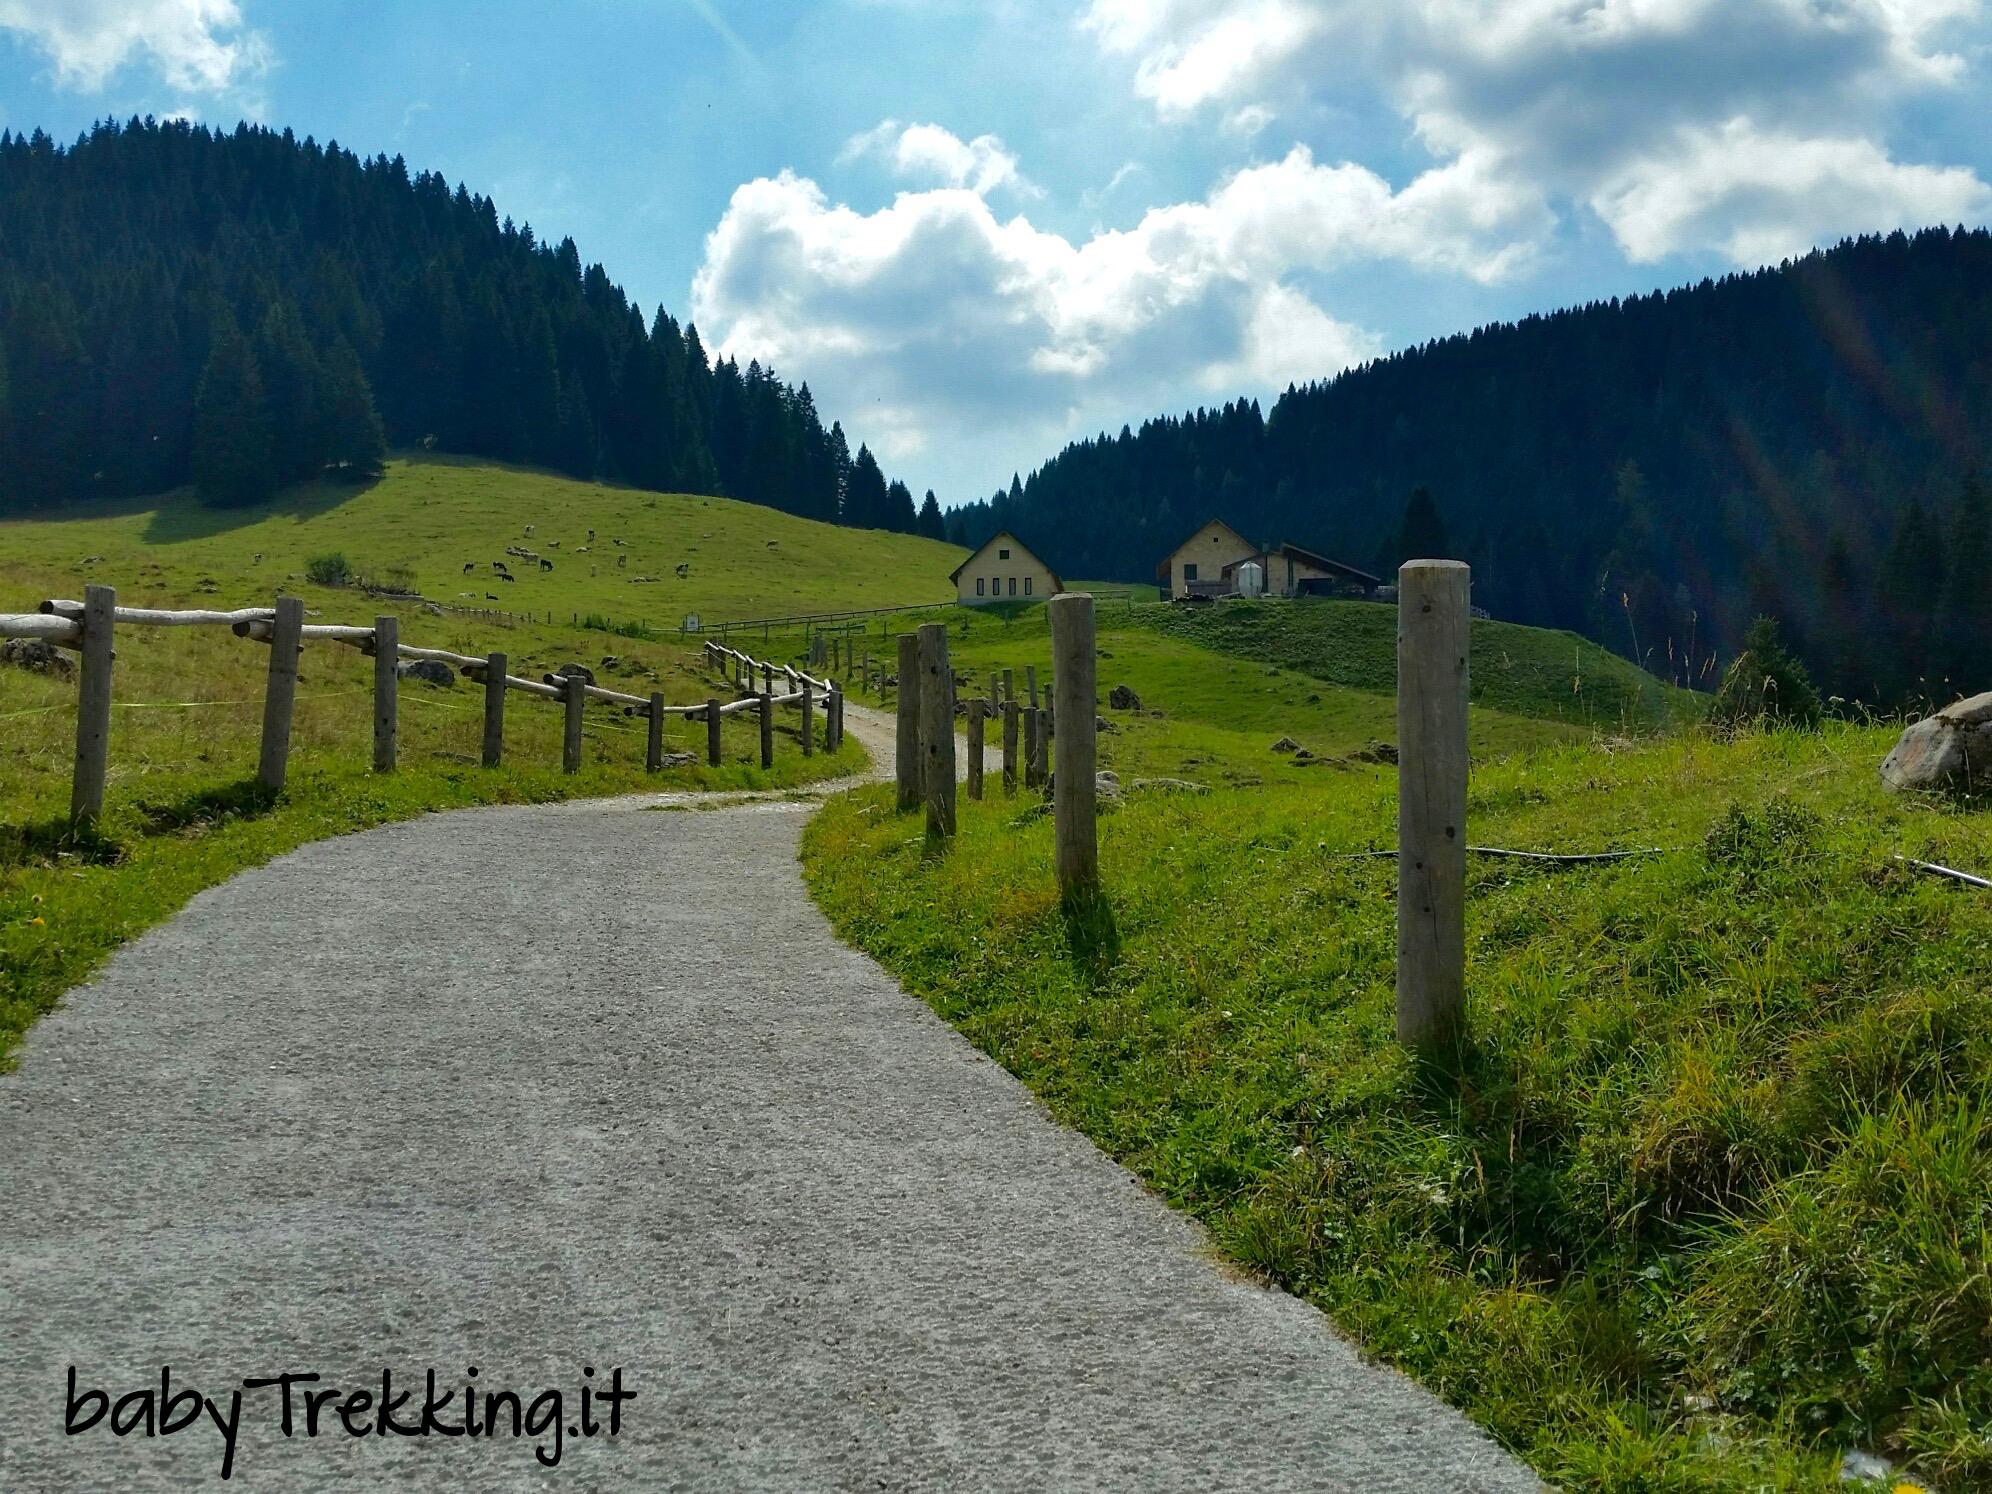 Alpe Cimbra e bambini: a Malga Vallorsara col passeggino